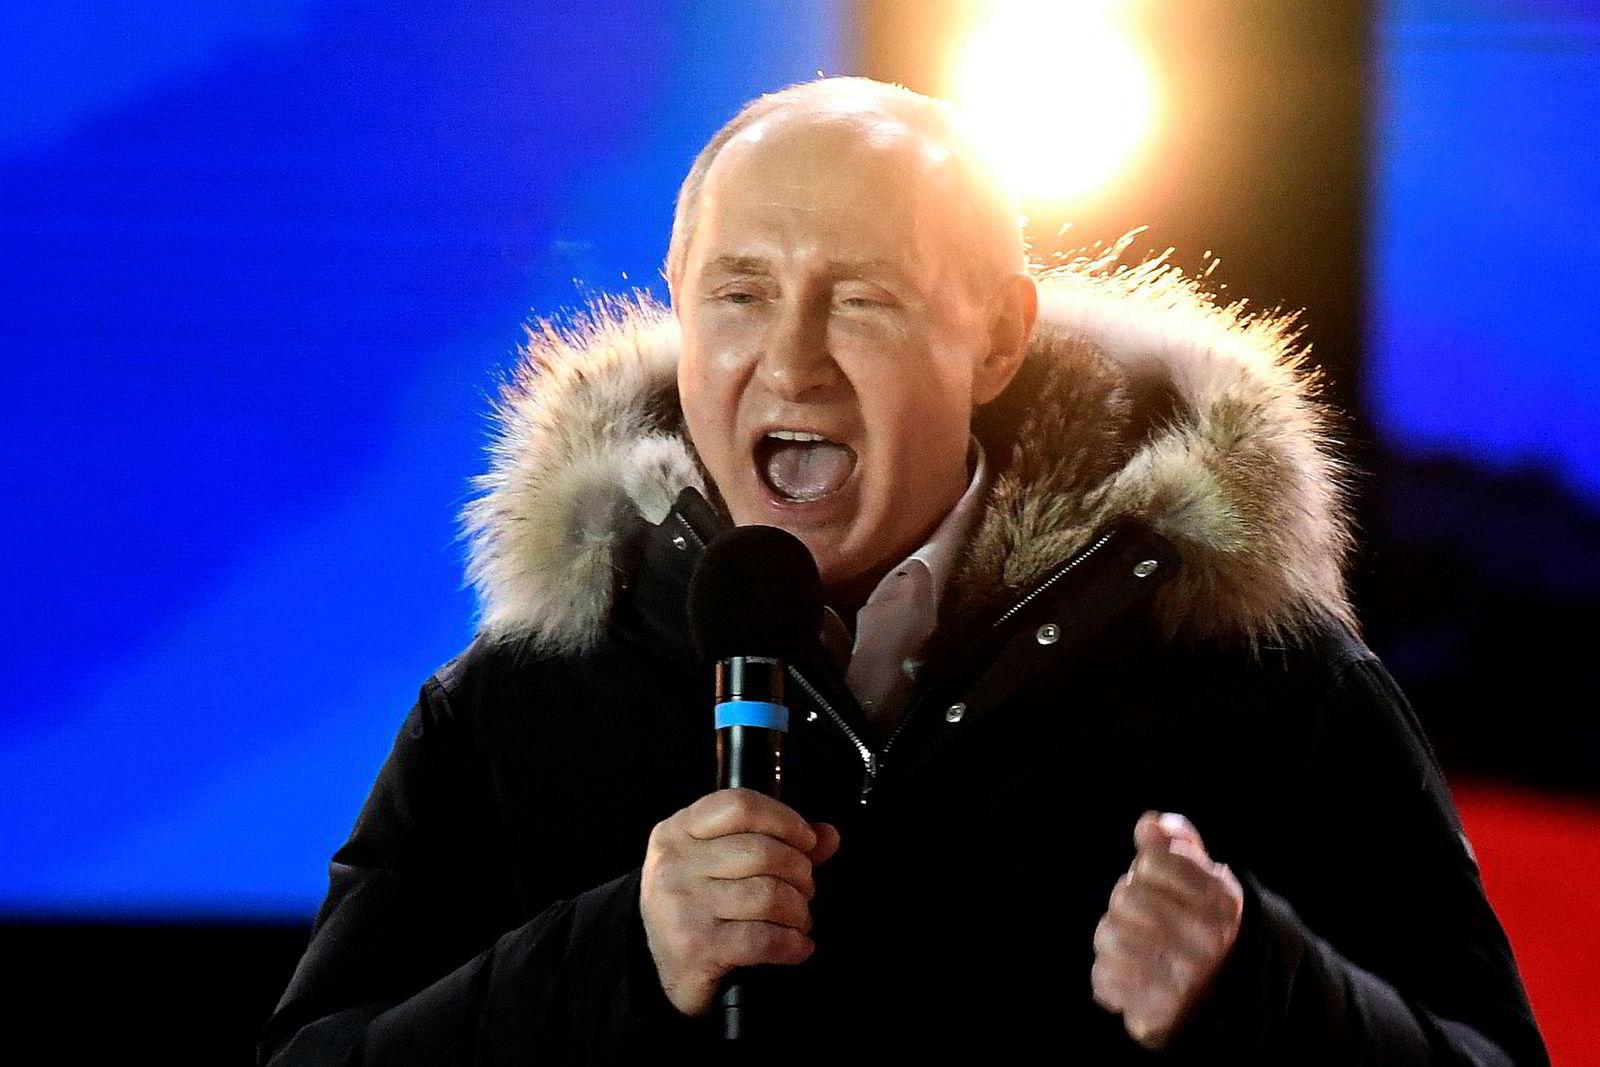 Vladimir Putin vant nok en gang valget i Russland. Foto: KIRILL KUDRYAVTSEV/AFP/NTB Scanpix